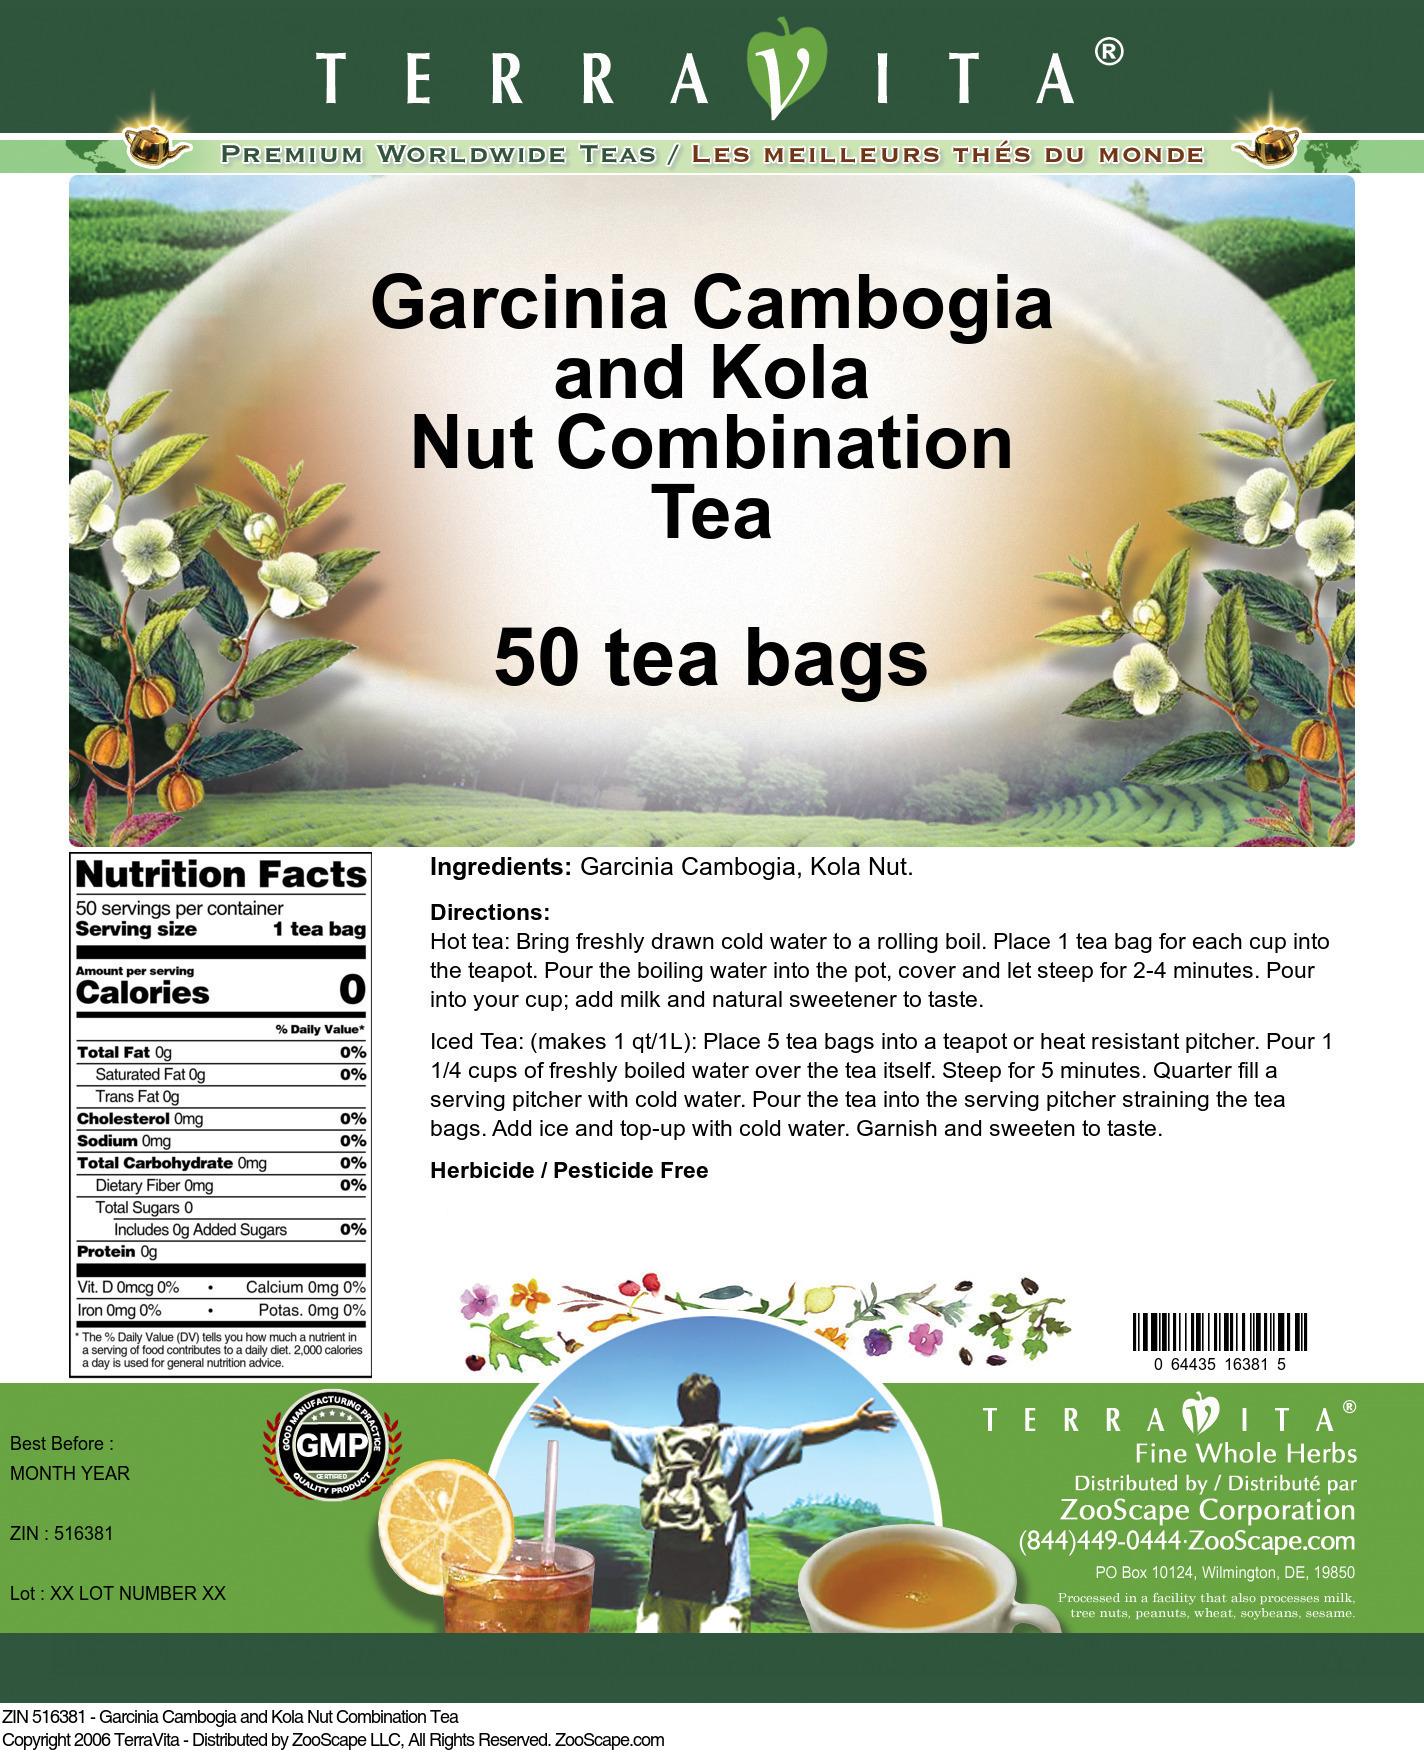 Garcinia Cambogia and Kola Nut Combination Tea